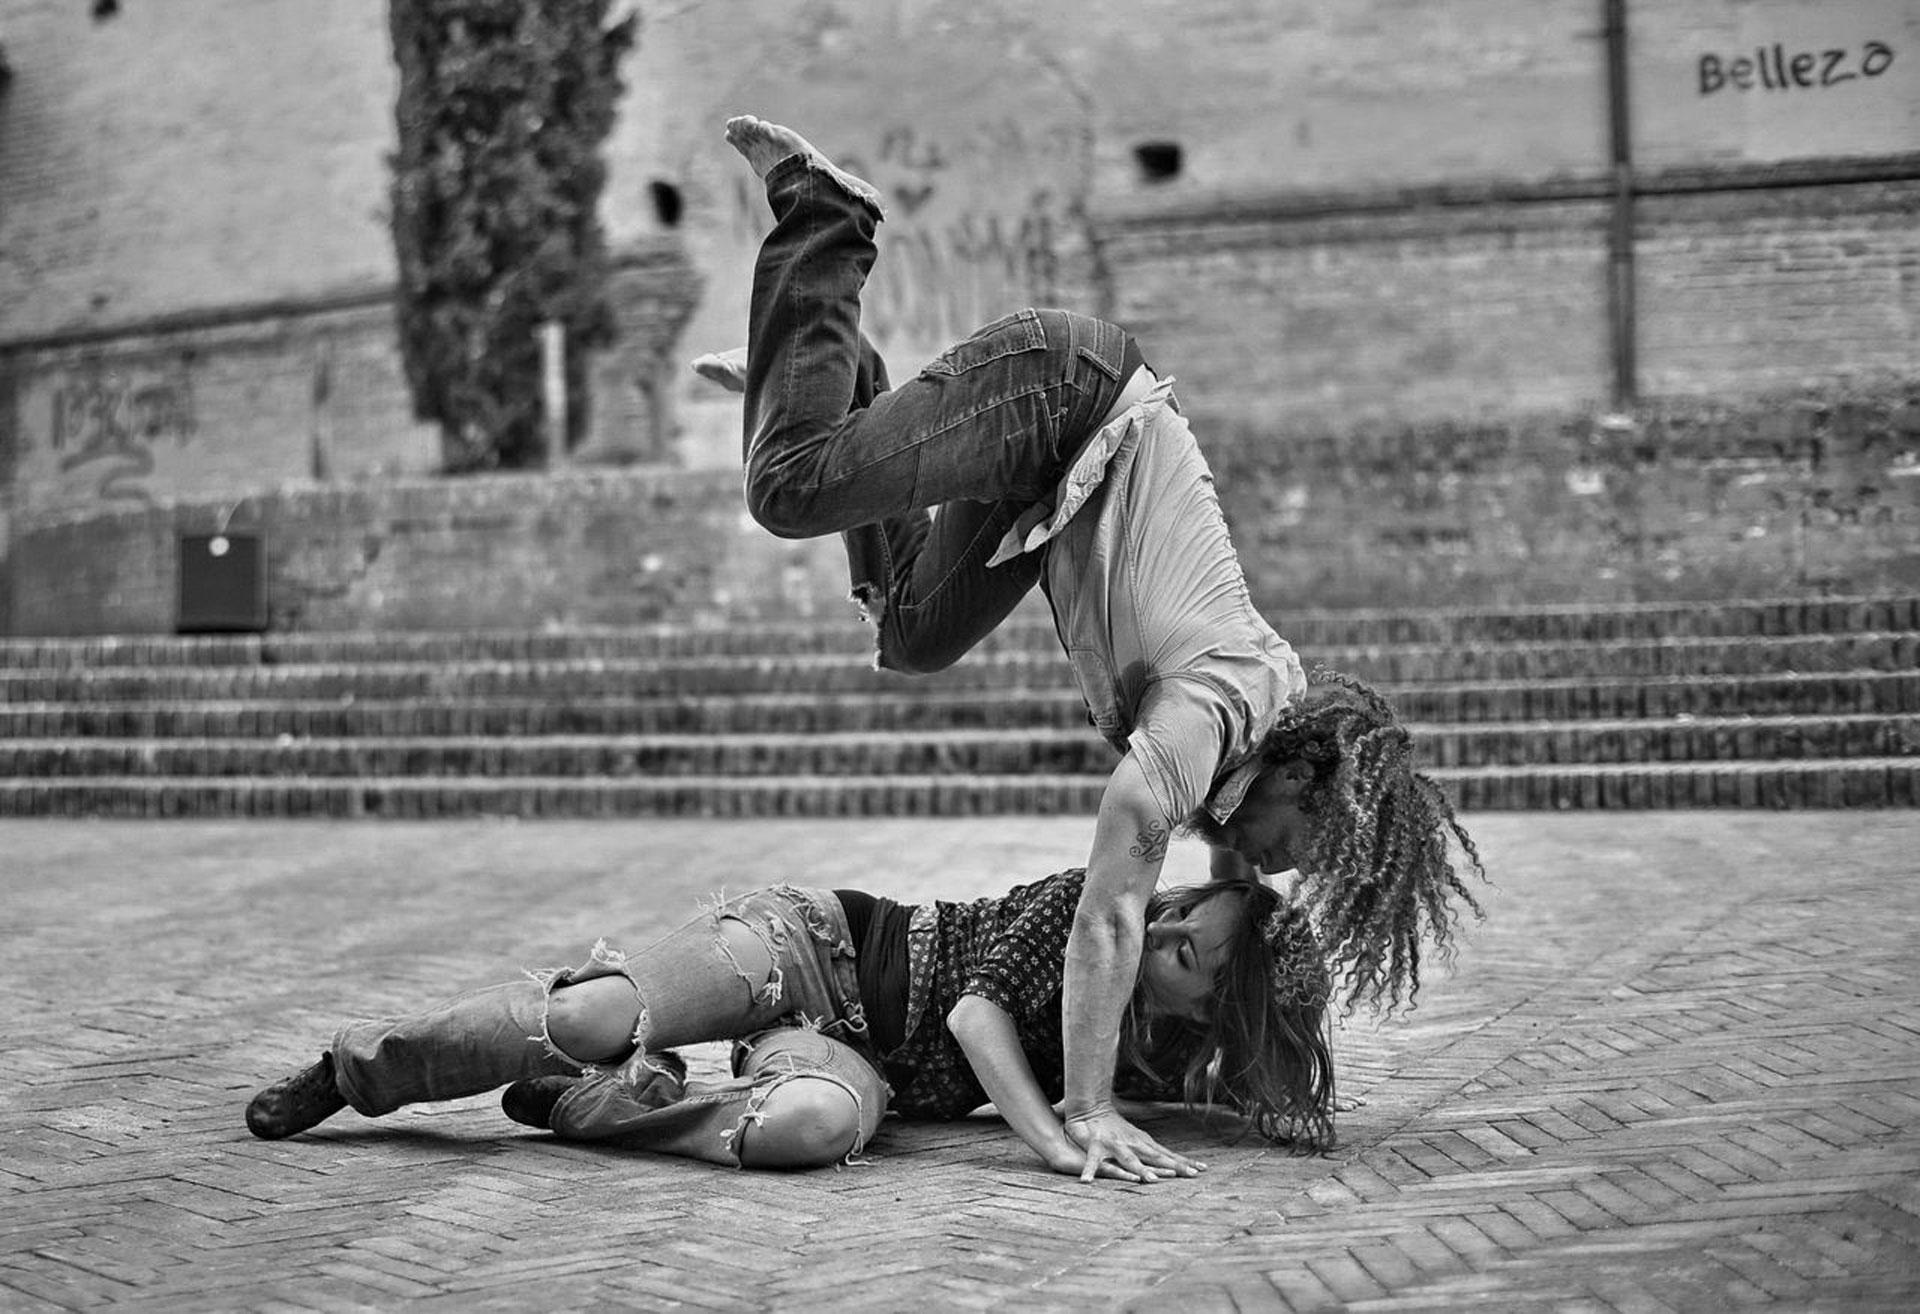 http://www.danzaurbana.eu/associazione/wp-content/uploads/2017/06/zuppiroli.jpg